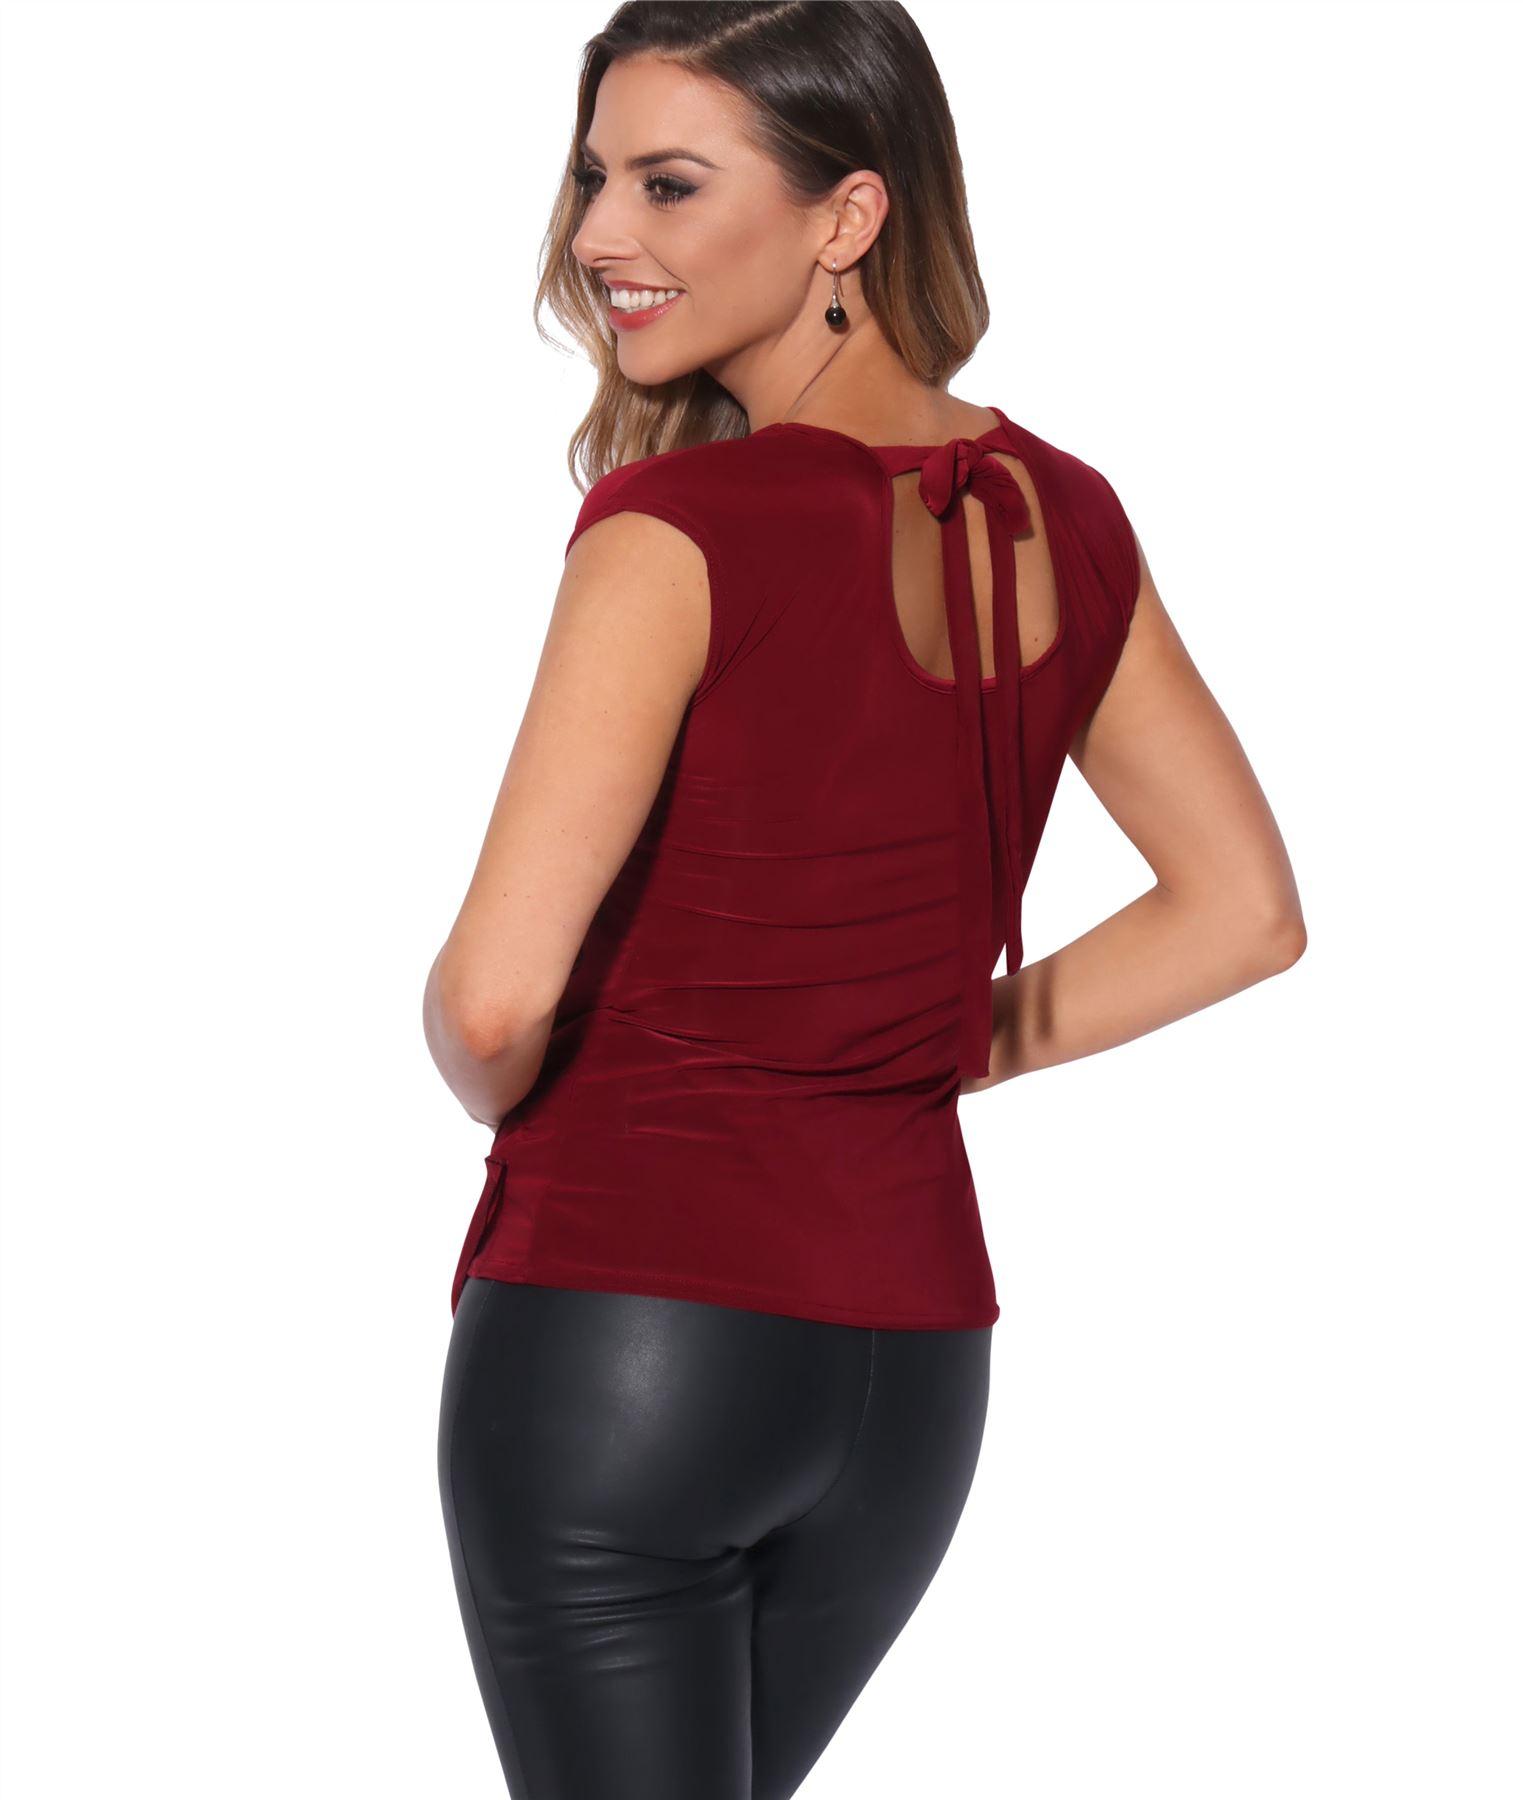 Femme-Top-Haut-Soiree-Decollete-N-ud-Dos-Chic-Sexy-Mode-Grande-Taille-Debardeur miniature 7